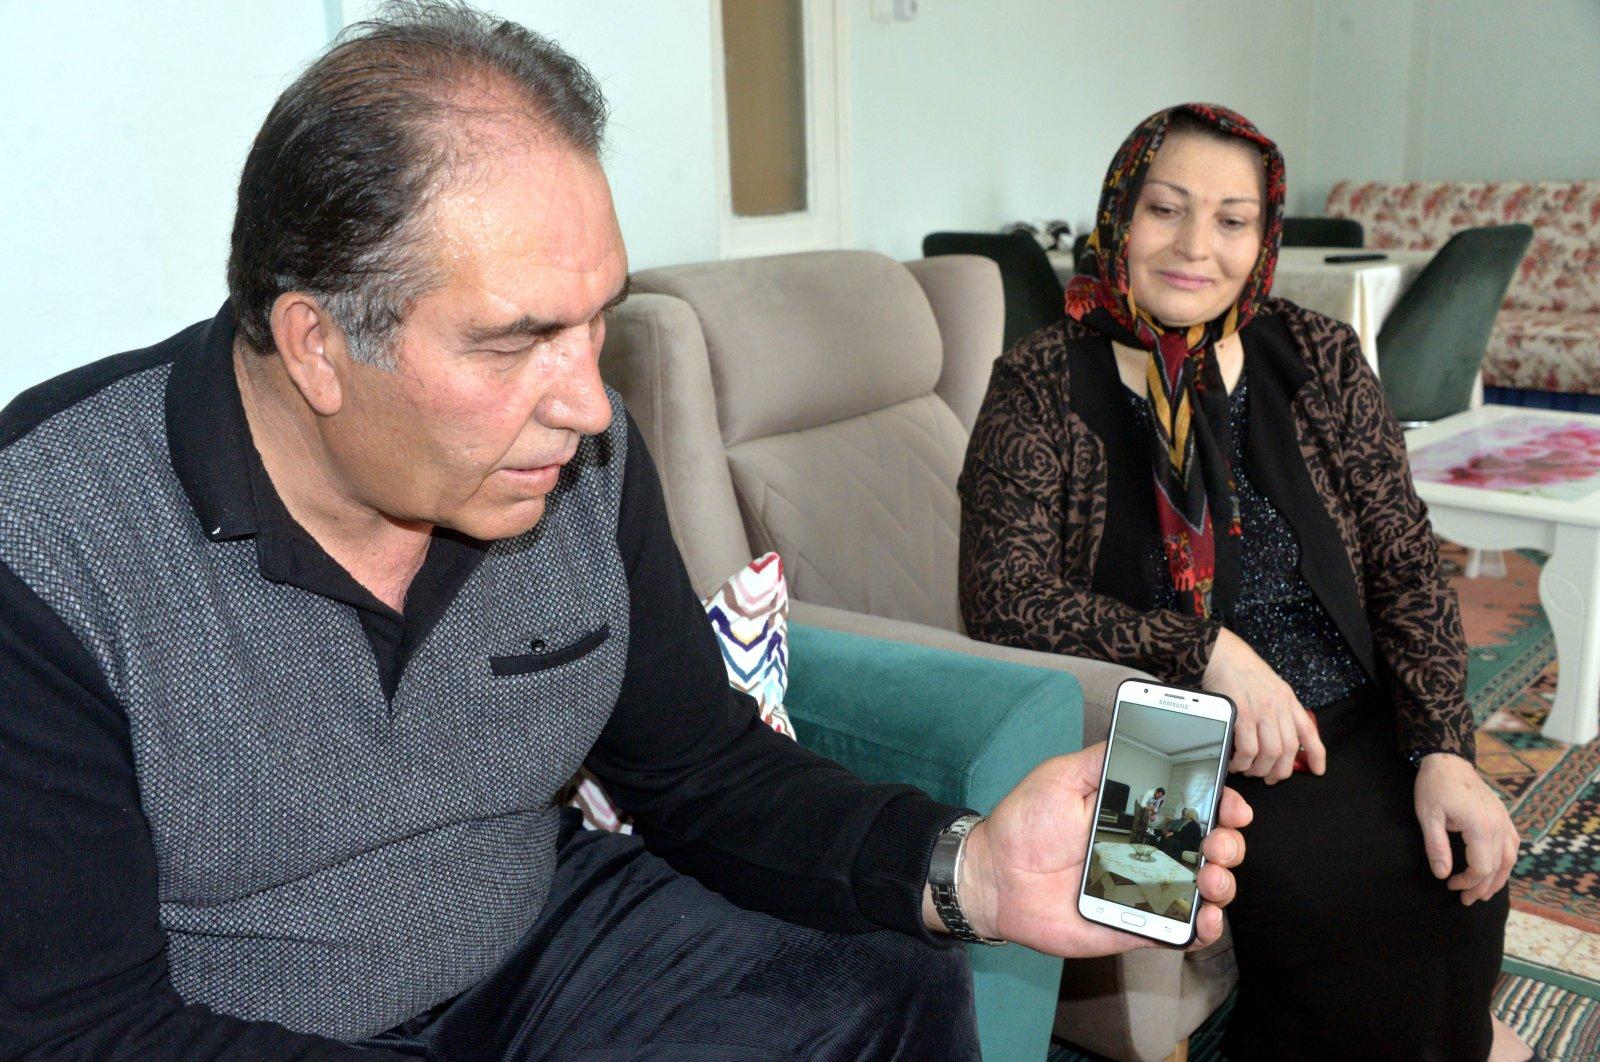 Rüştü Çınkır (L) watches his son as he puts on engagement ring, in Kahramanmaraş, Turkey, Wednesday, April 1, 2020. (DHA Photo)